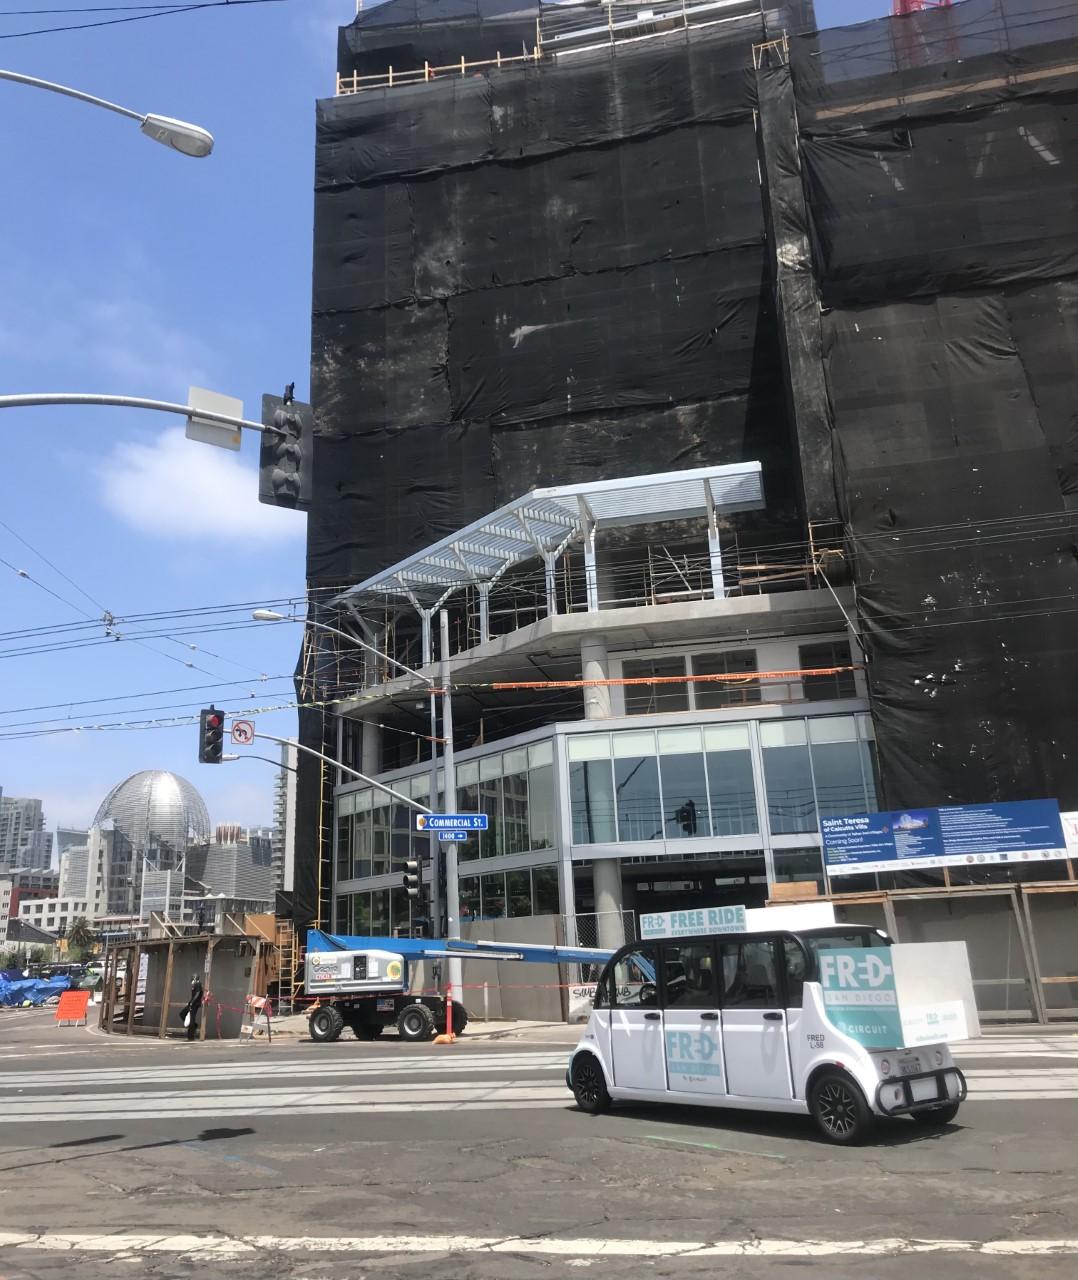 Saint Teresa of Calcutta Villa development taking shape downtown